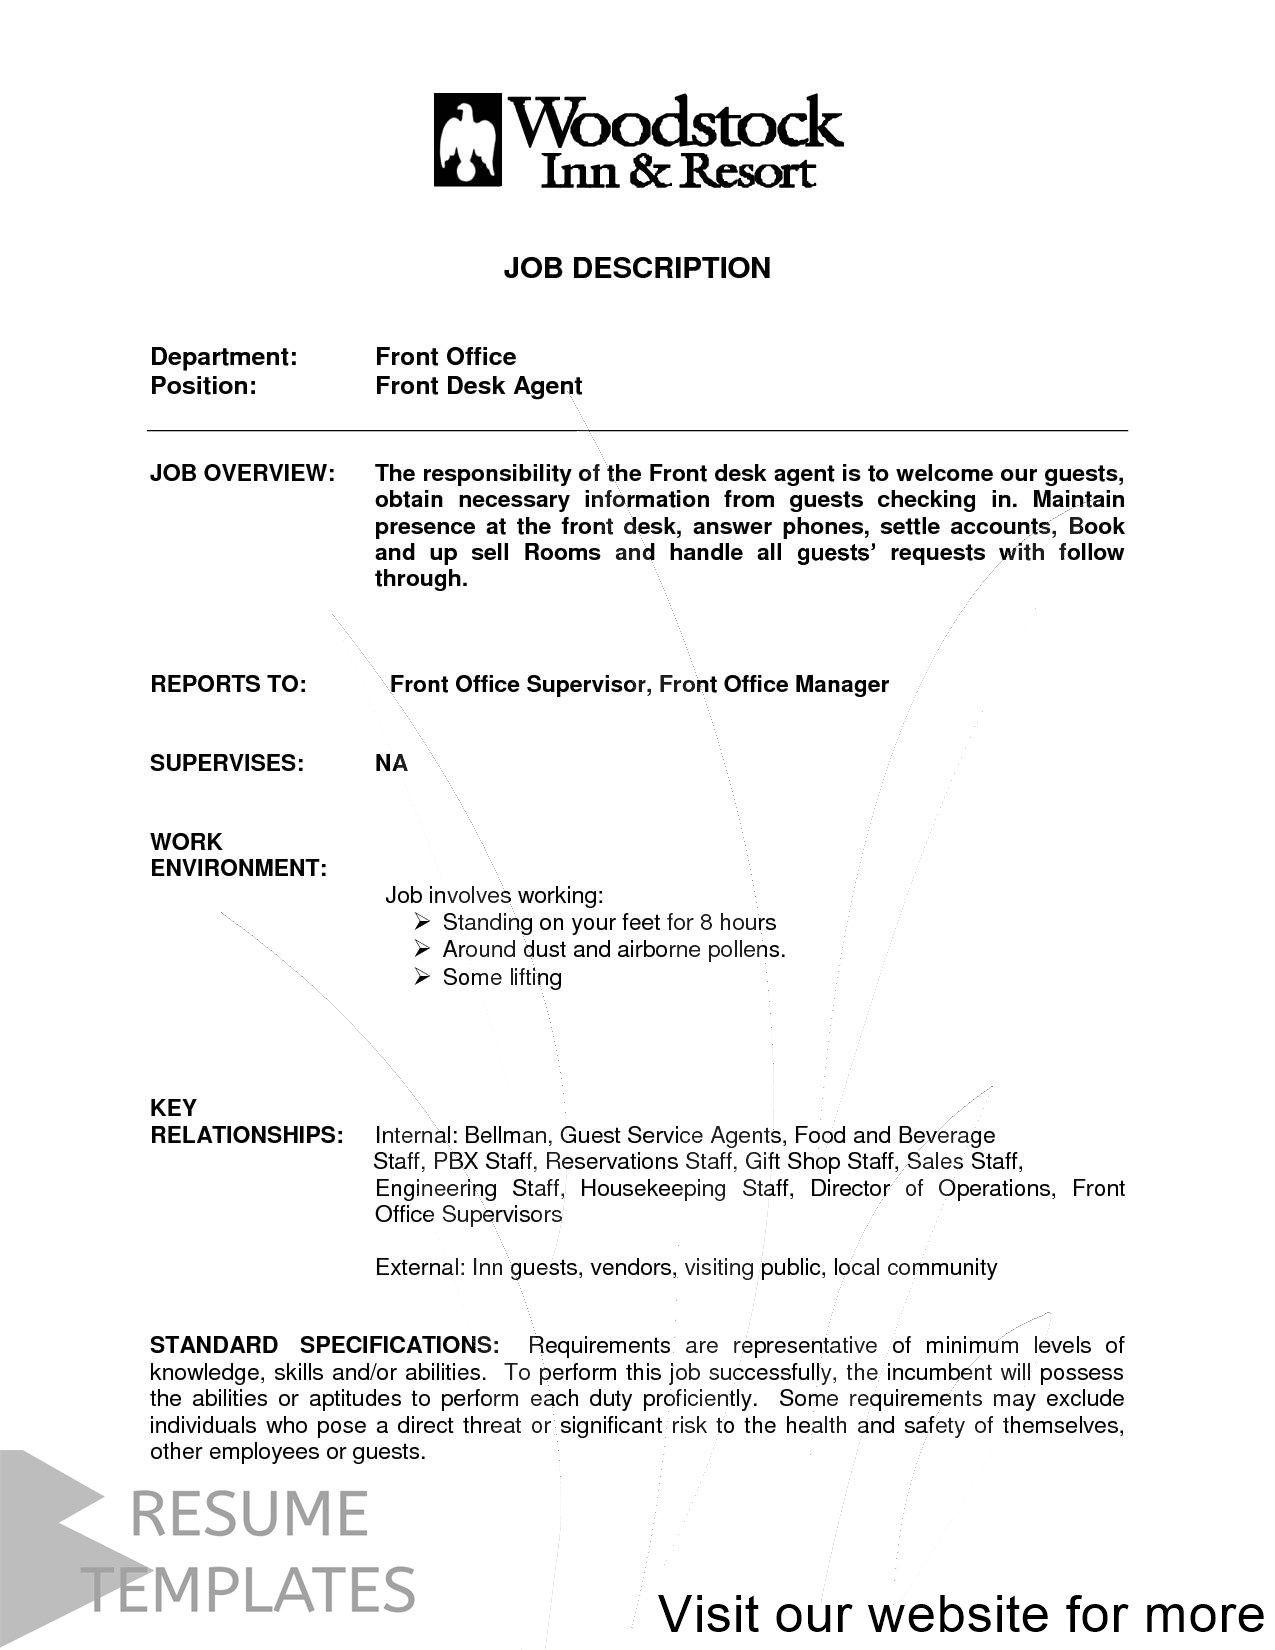 free resume builder linkedin Best in 2020 Resume cover